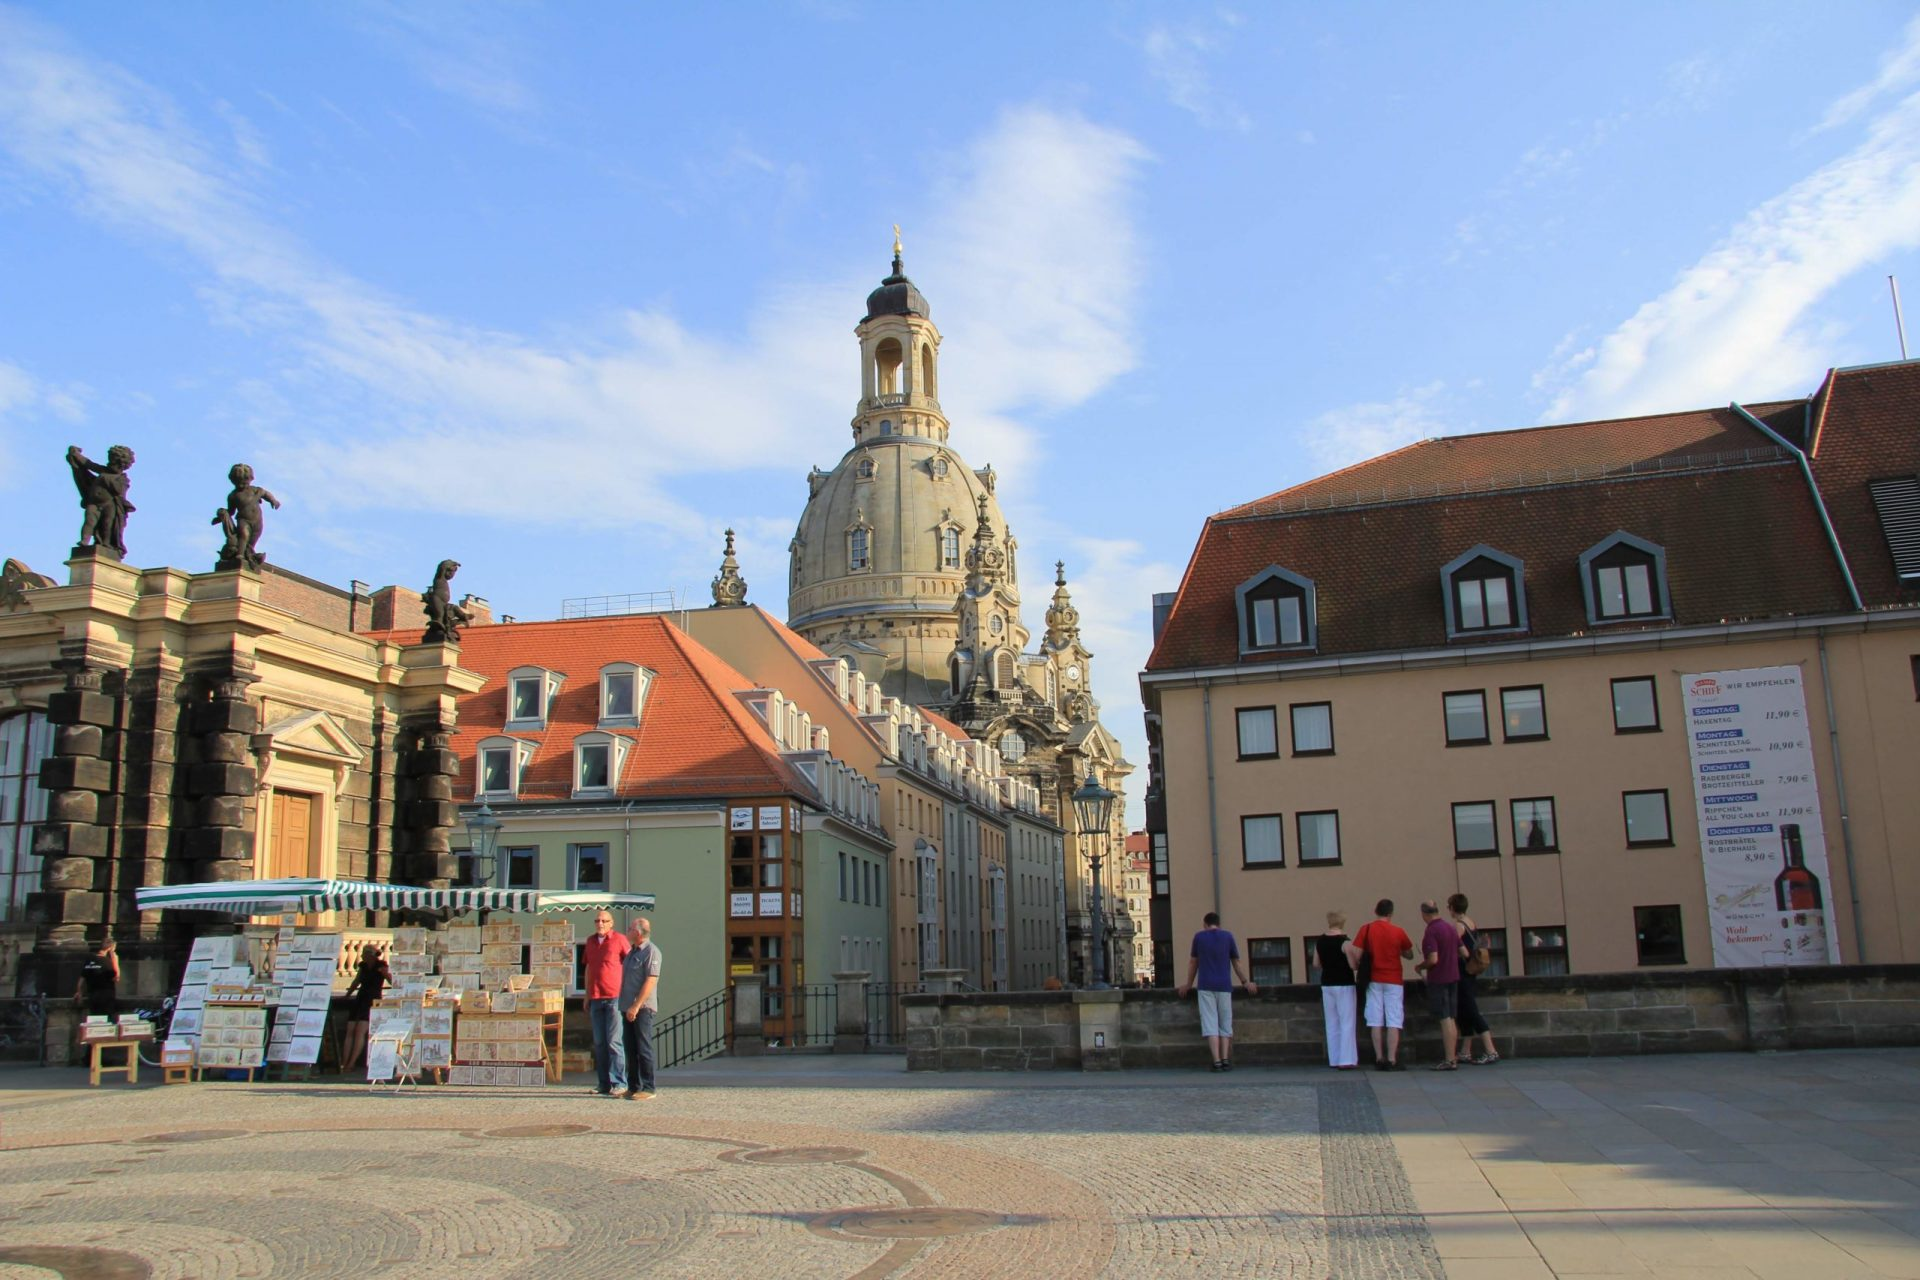 Фрауэнкирхе, Дрезден Германия, Июль, 2013